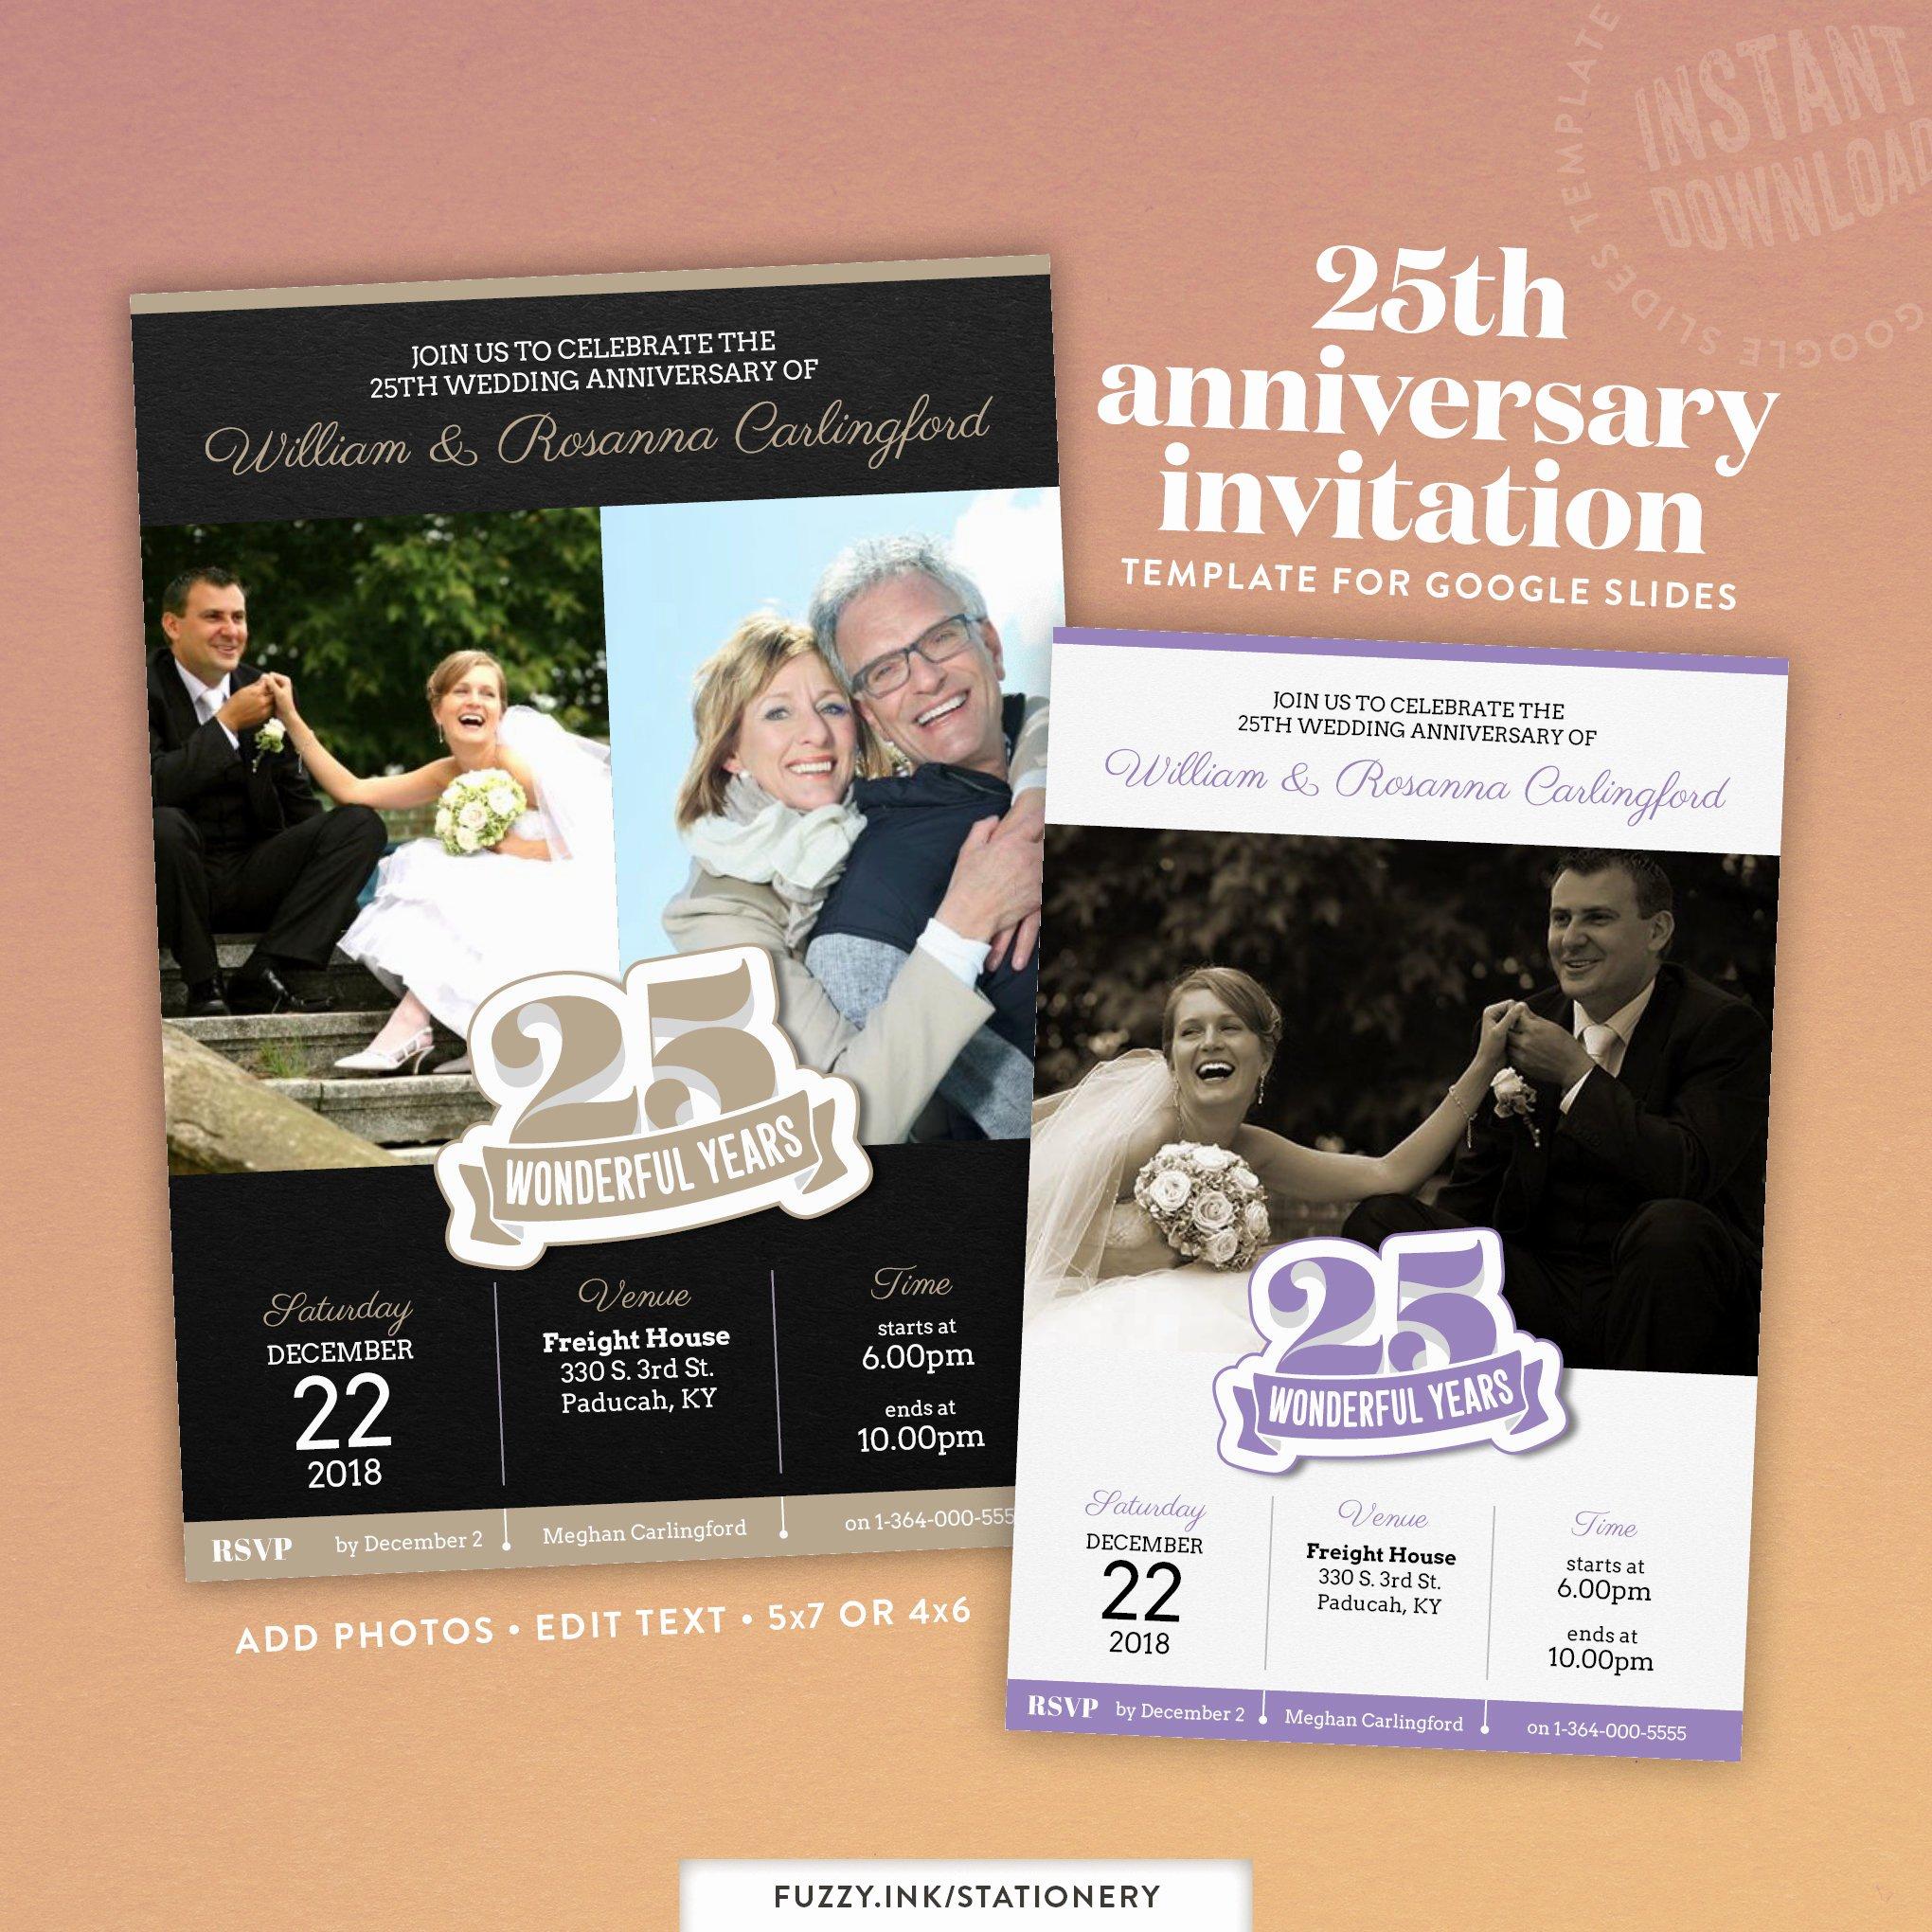 25th Wedding Anniversary Invitations Templates Lovely 25th Wedding Anniversary Party Invitation or Evite Template